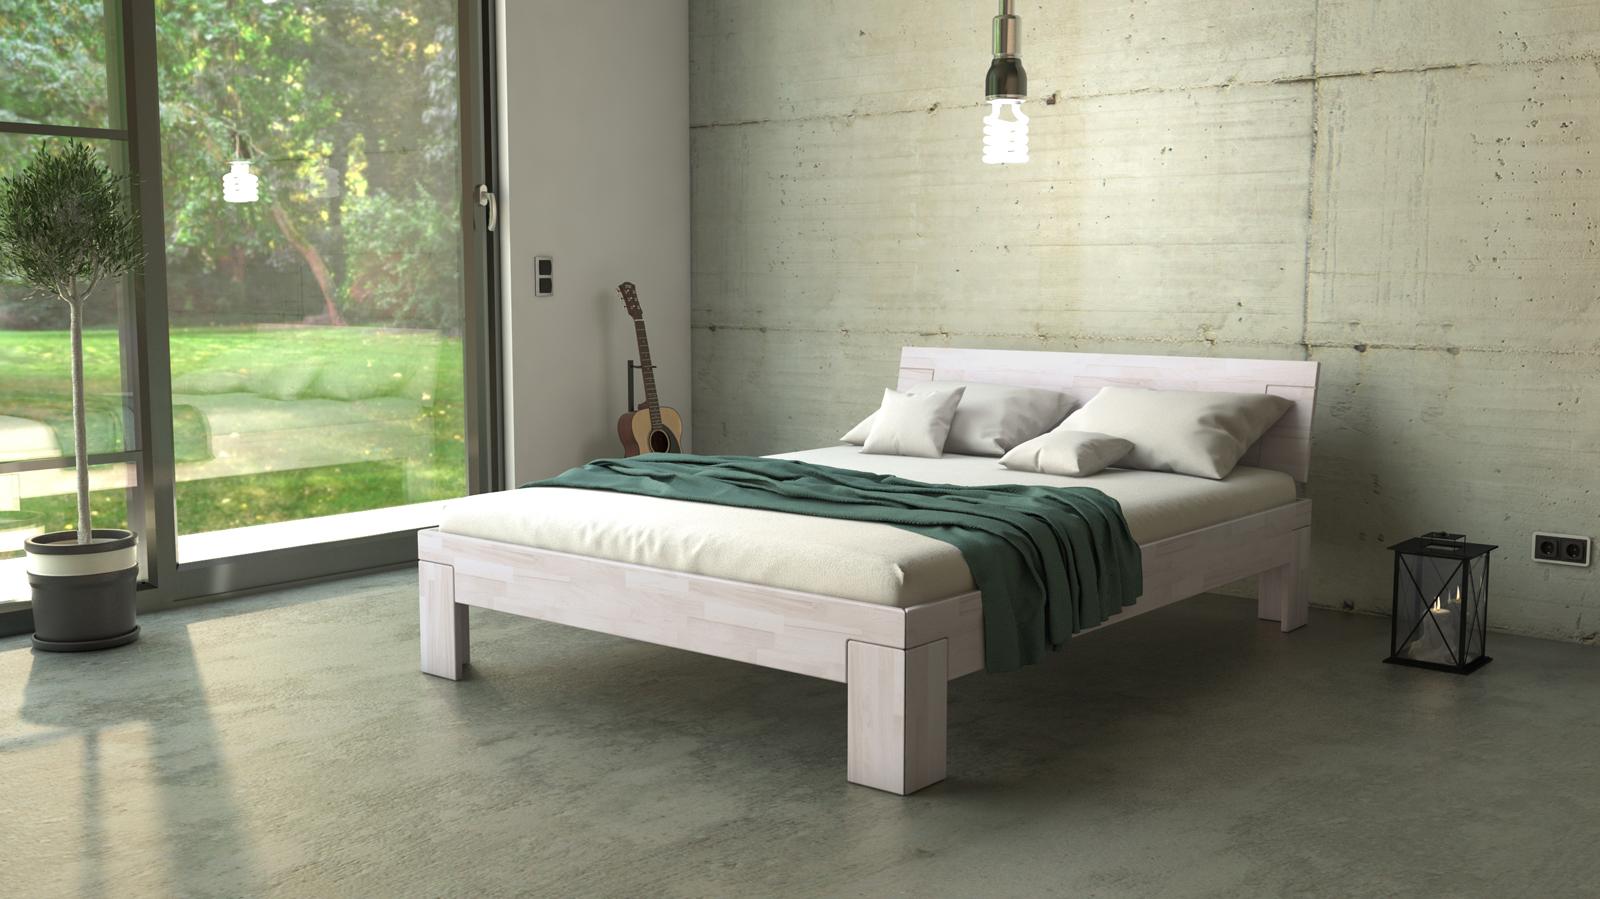 sam massivholzbett doppelbett buche wei lasiert 140 x. Black Bedroom Furniture Sets. Home Design Ideas